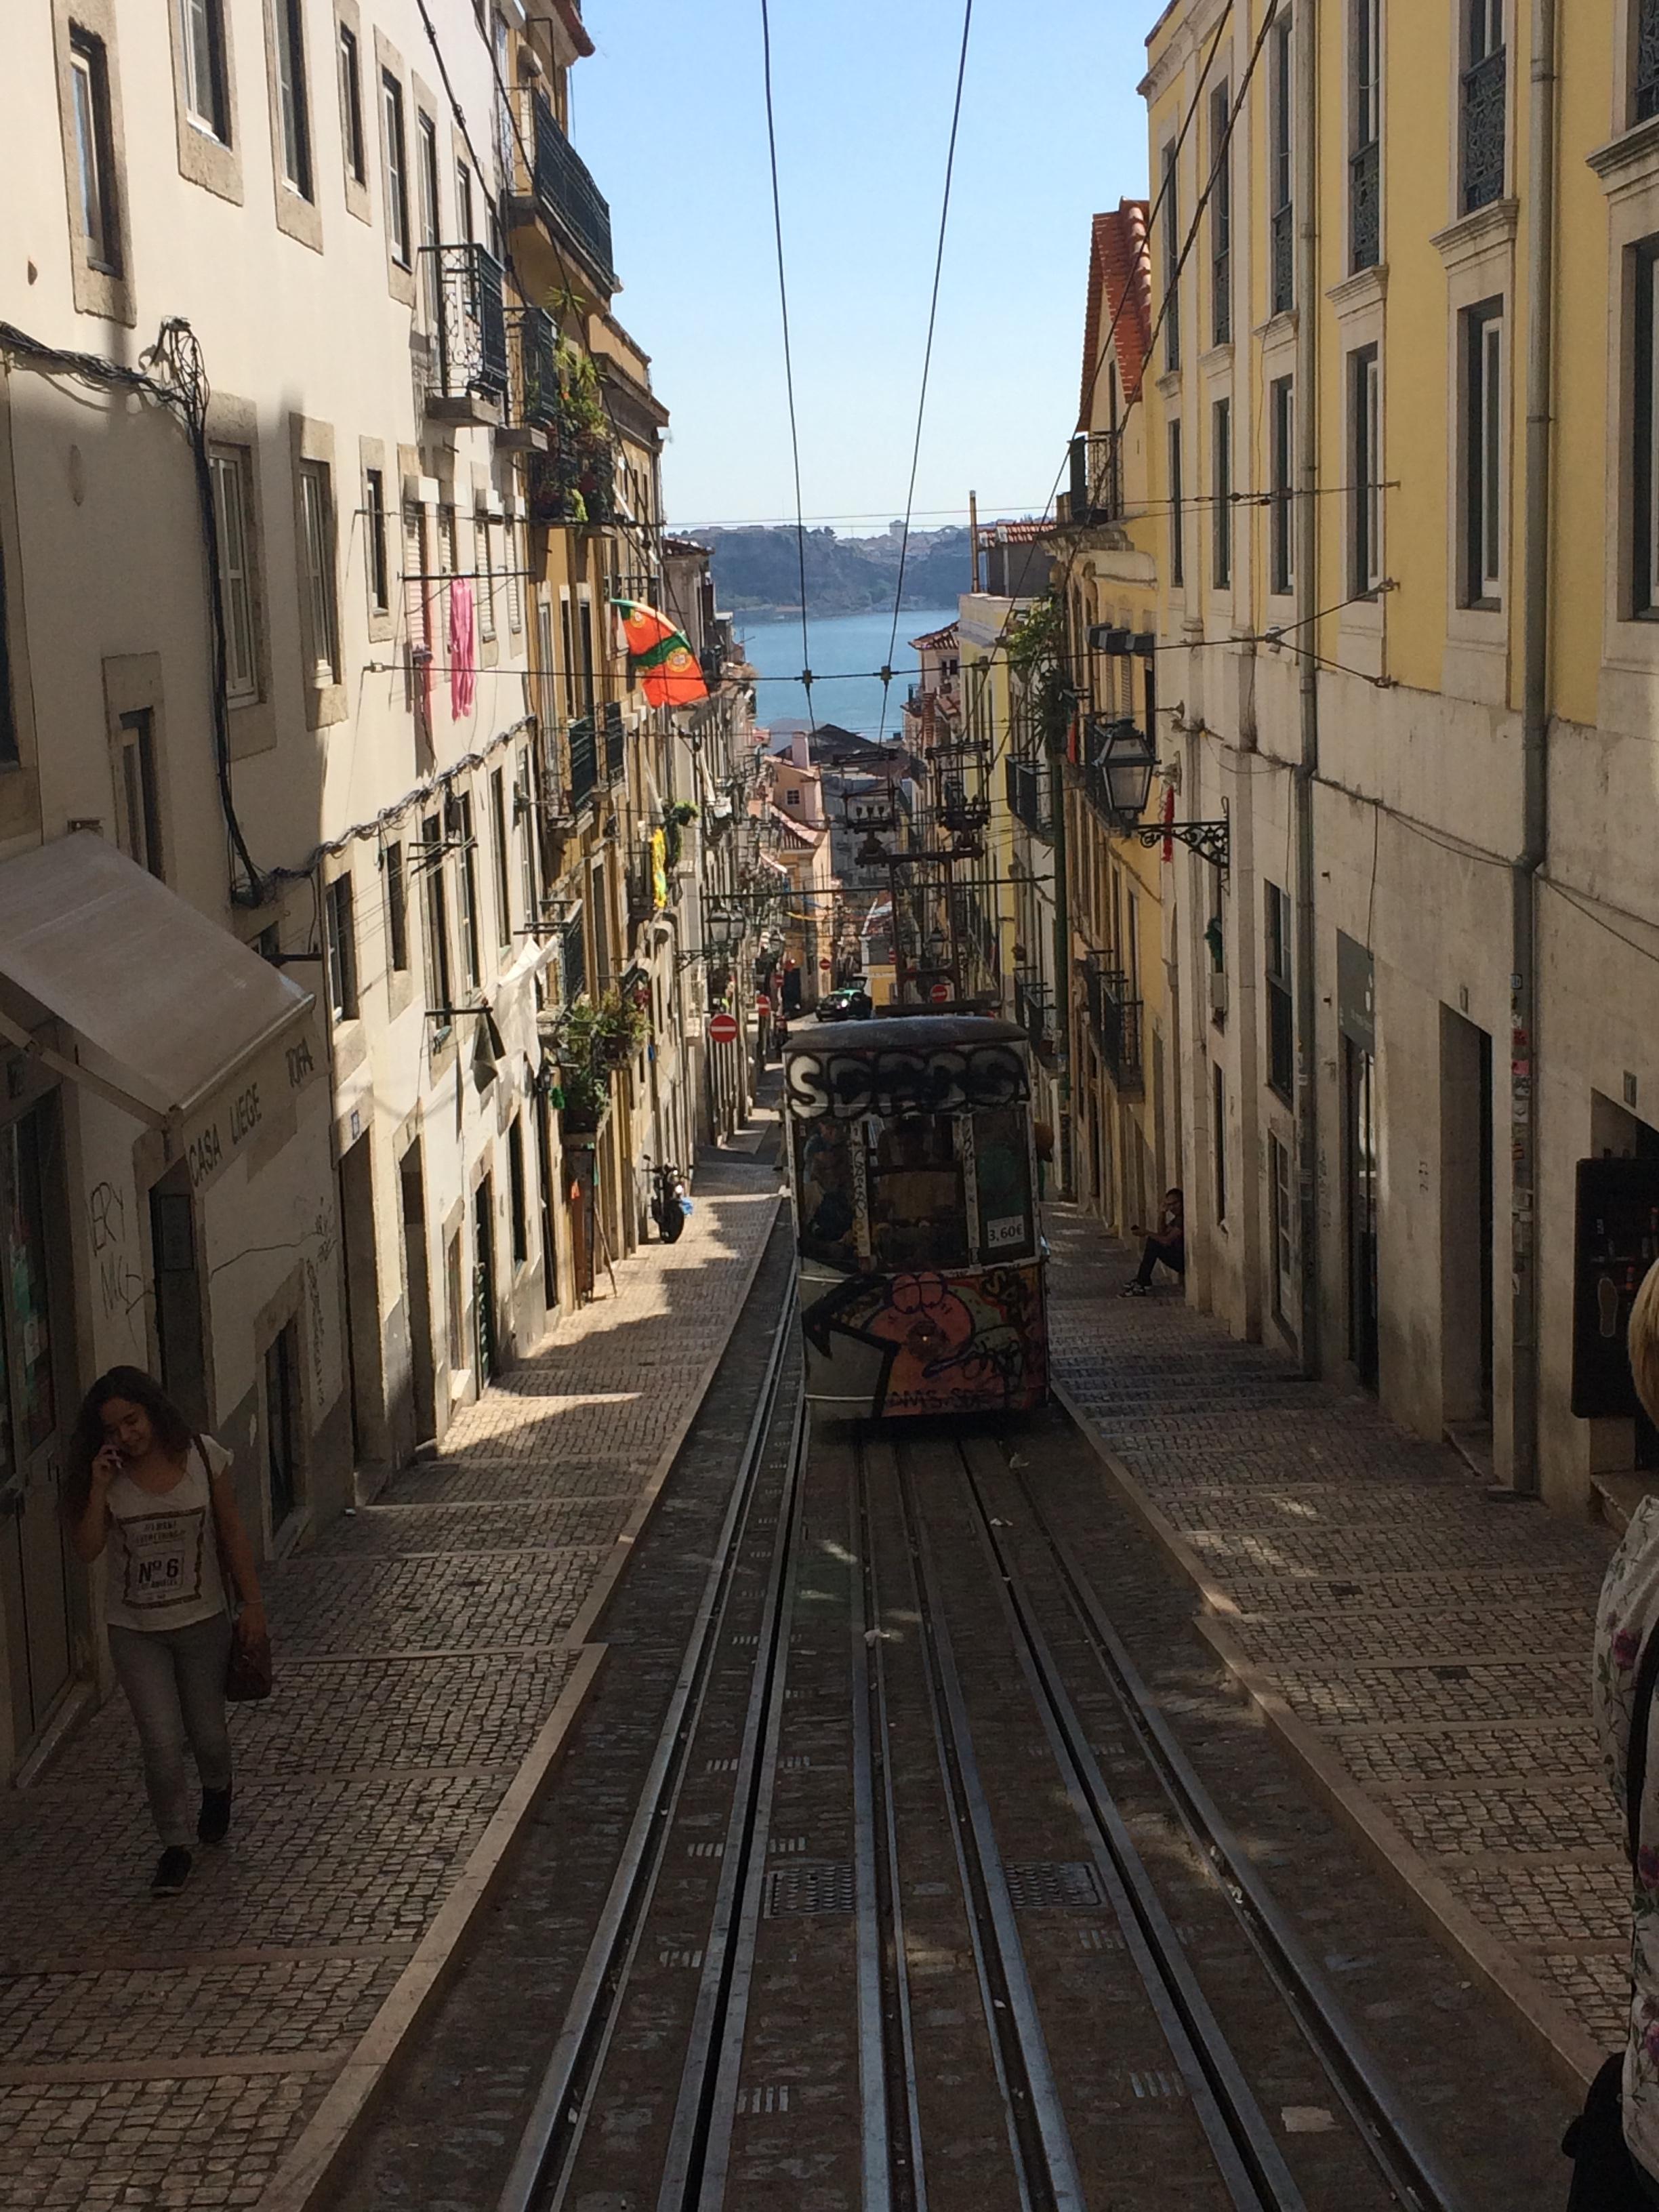 Lisbon's signature streetcars are everywhere